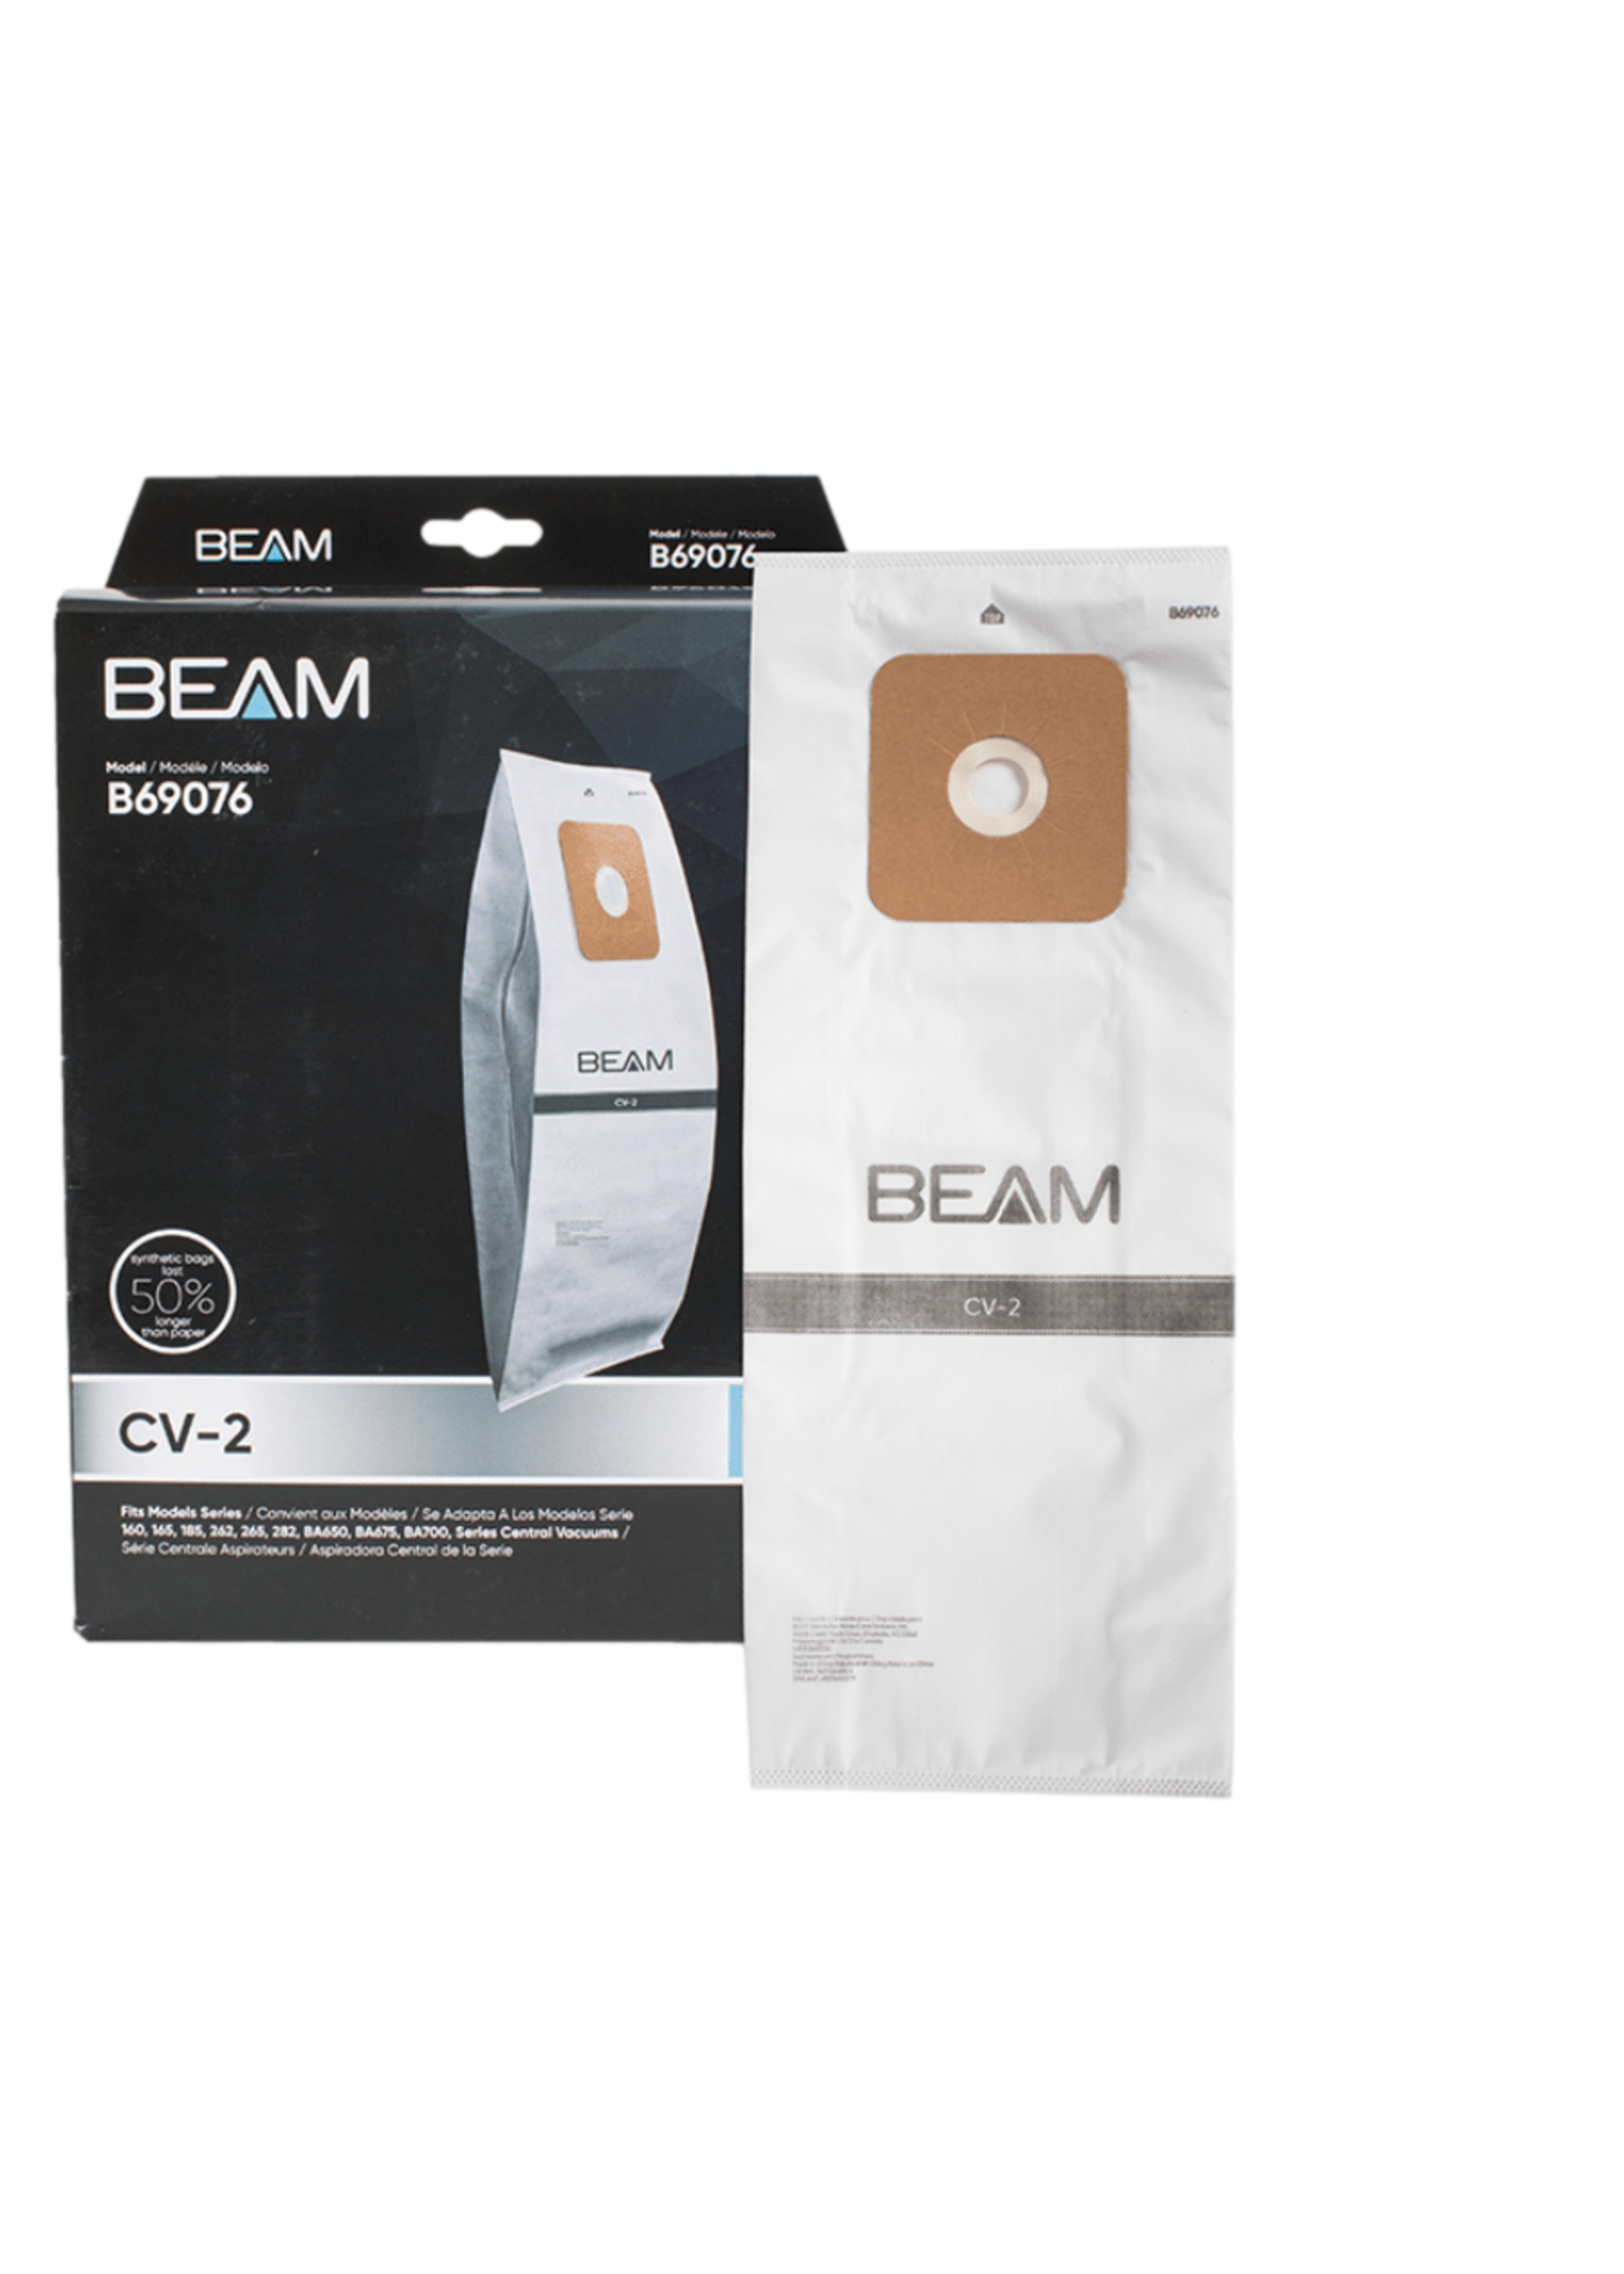 Electrolux Beam Central Vacuum Bags - CV-2